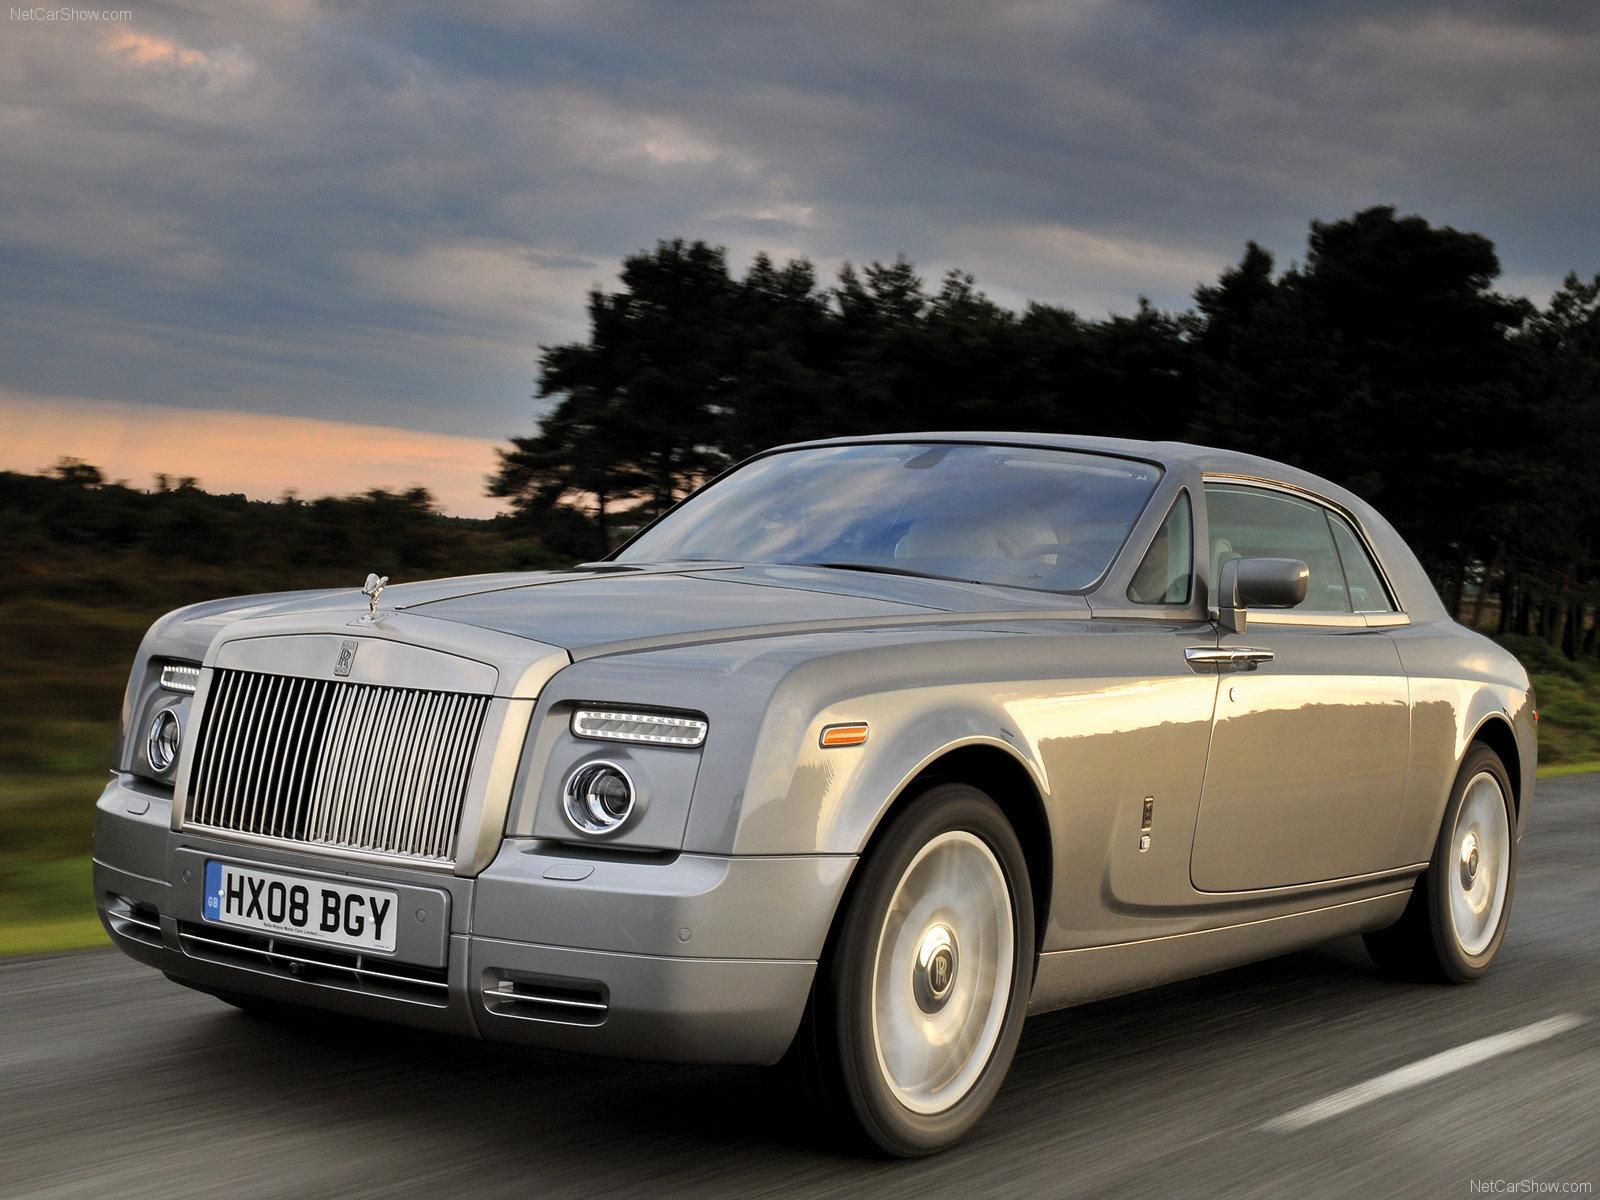 Rolls royce royal luxury car hd taste wallpapers - Royal royce car wallpaper ...